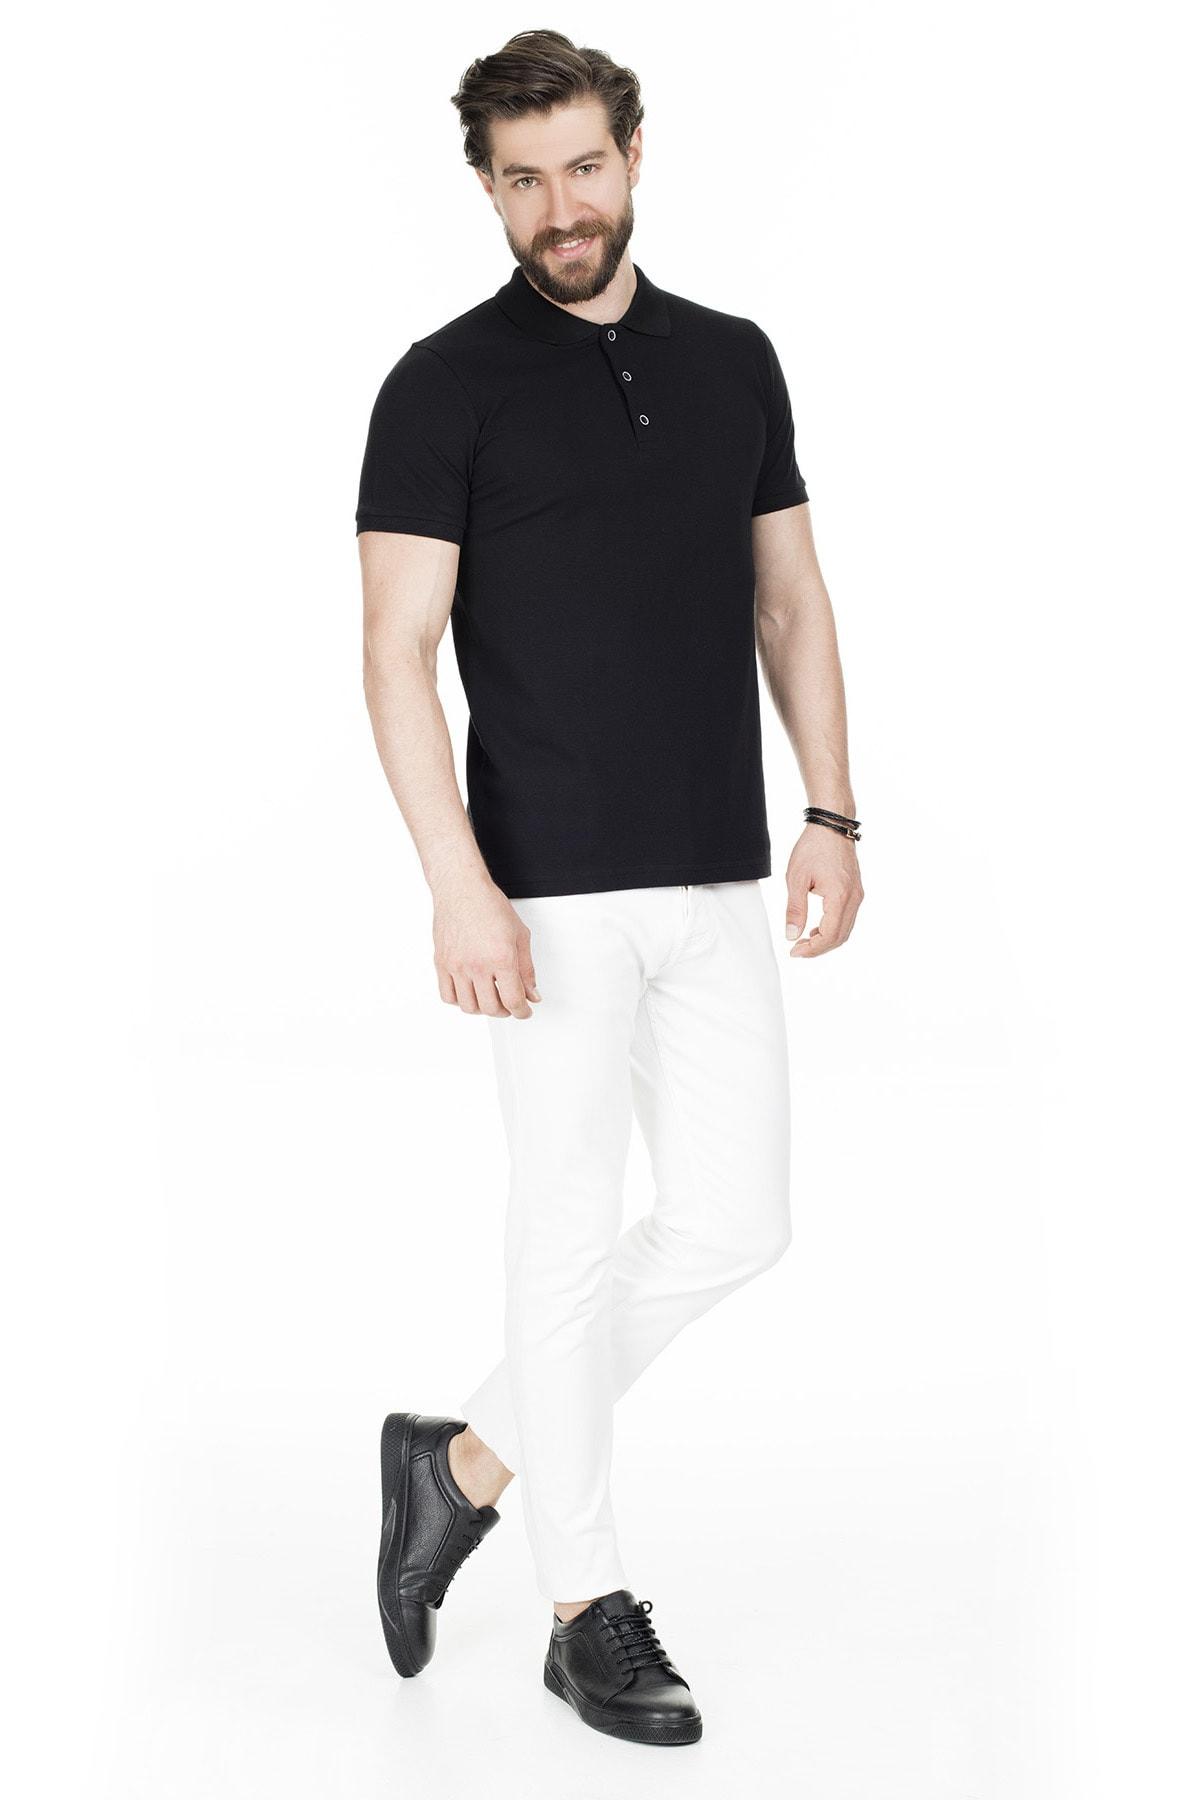 Buratti Erkek Siyah Düğmeli Polo Yaka Pamuklu Günlük T Shirt 4362050 3